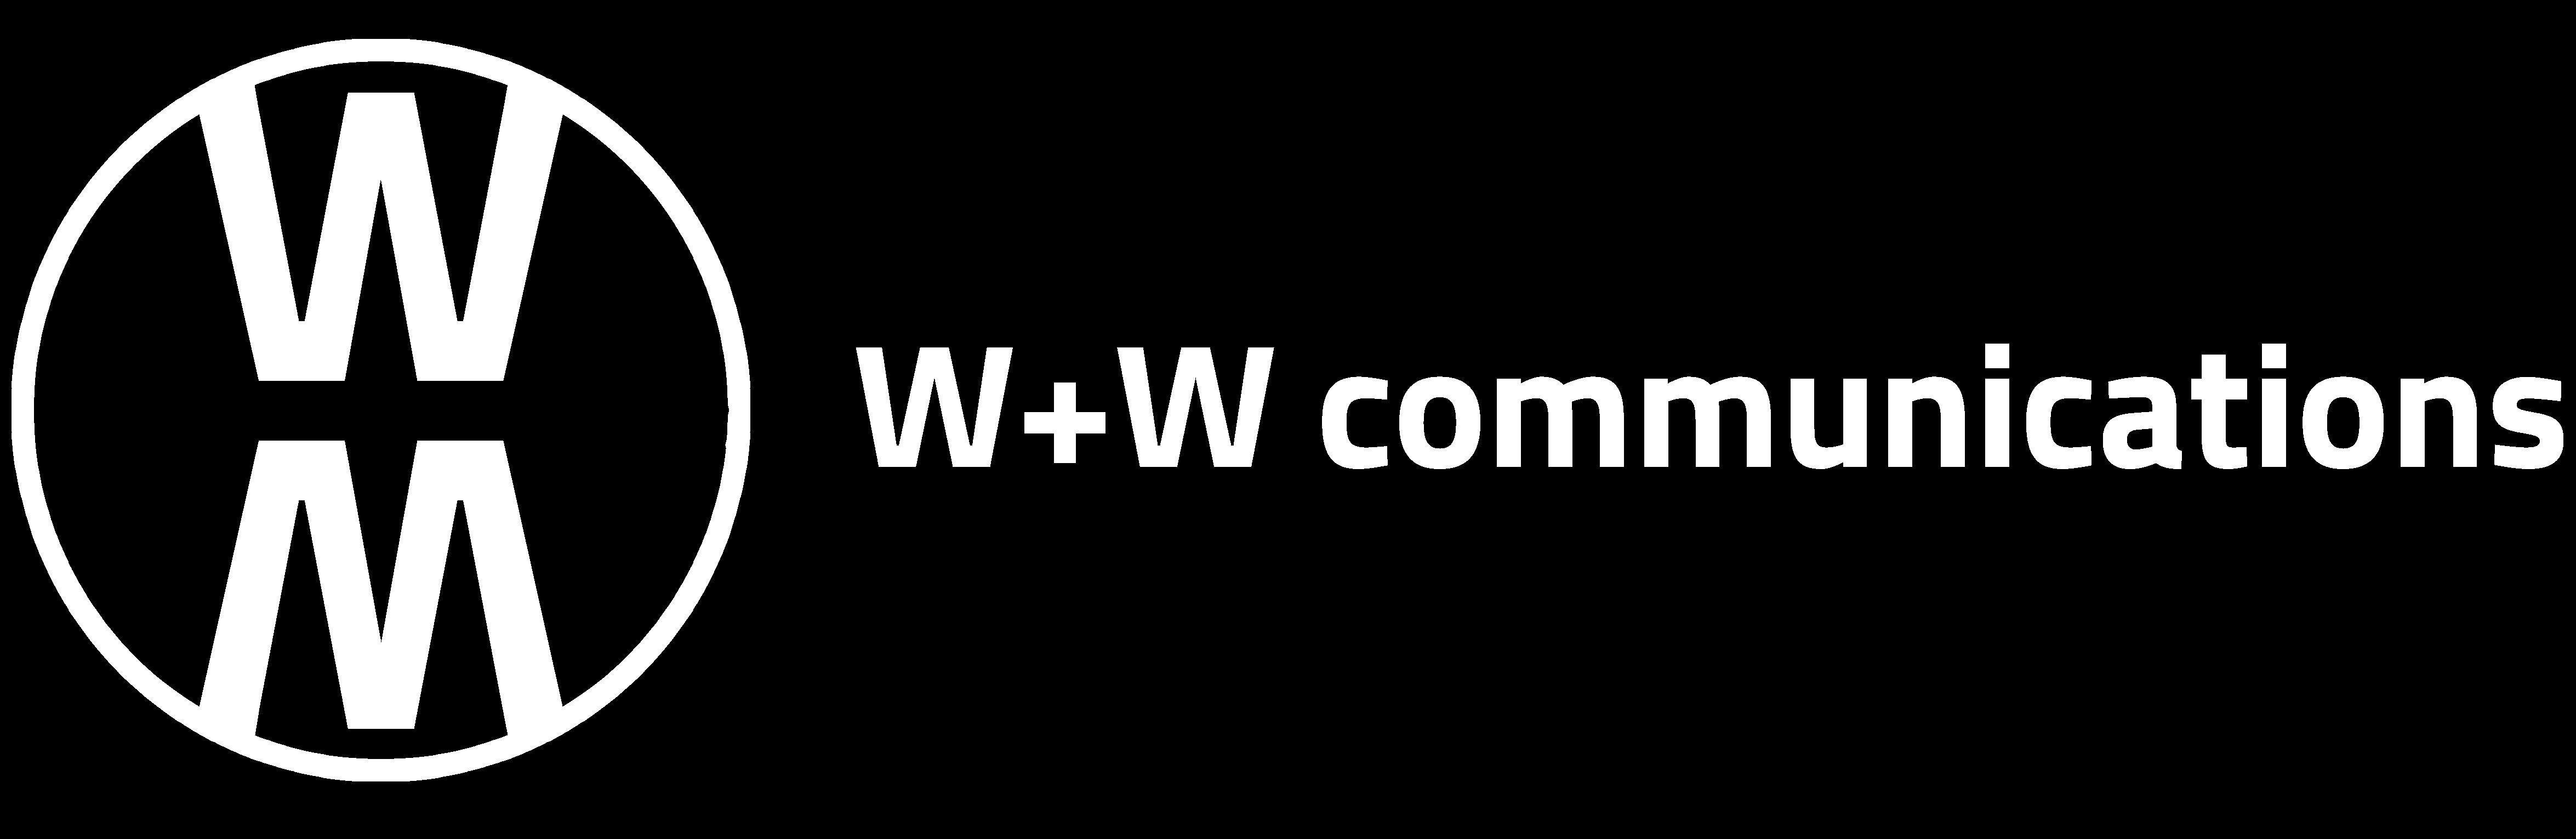 W+W communications